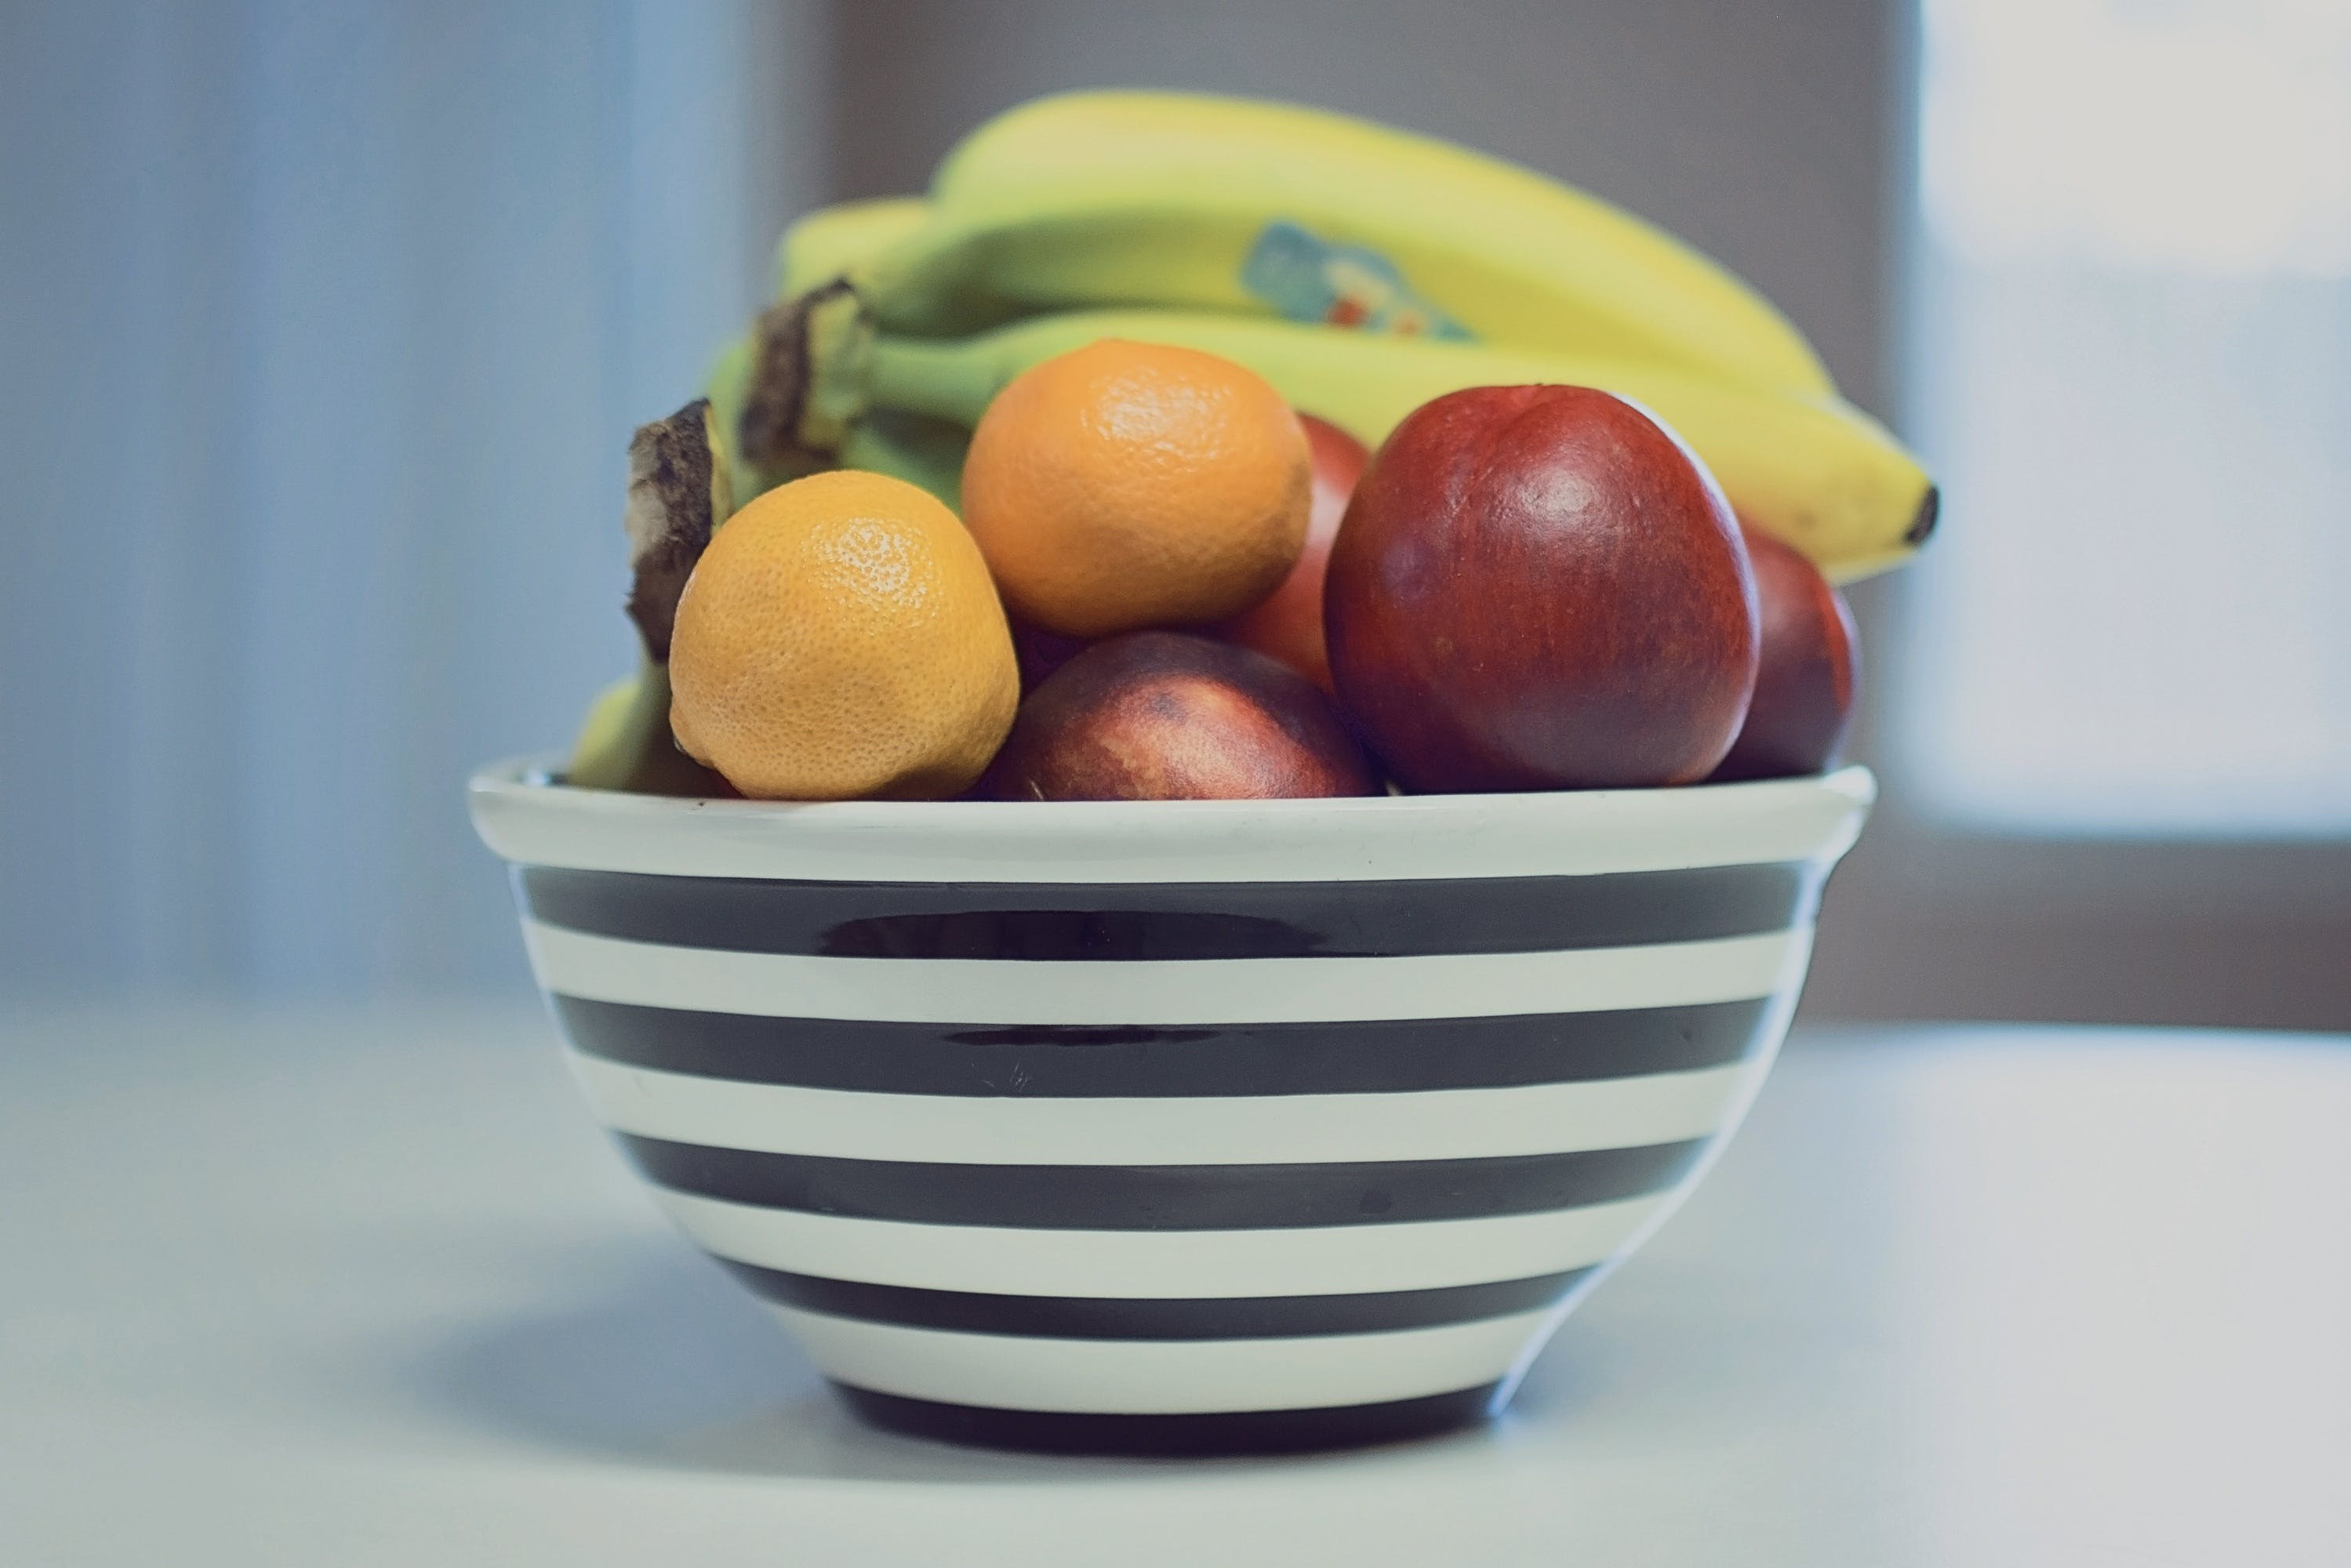 apples, assorted, bananas